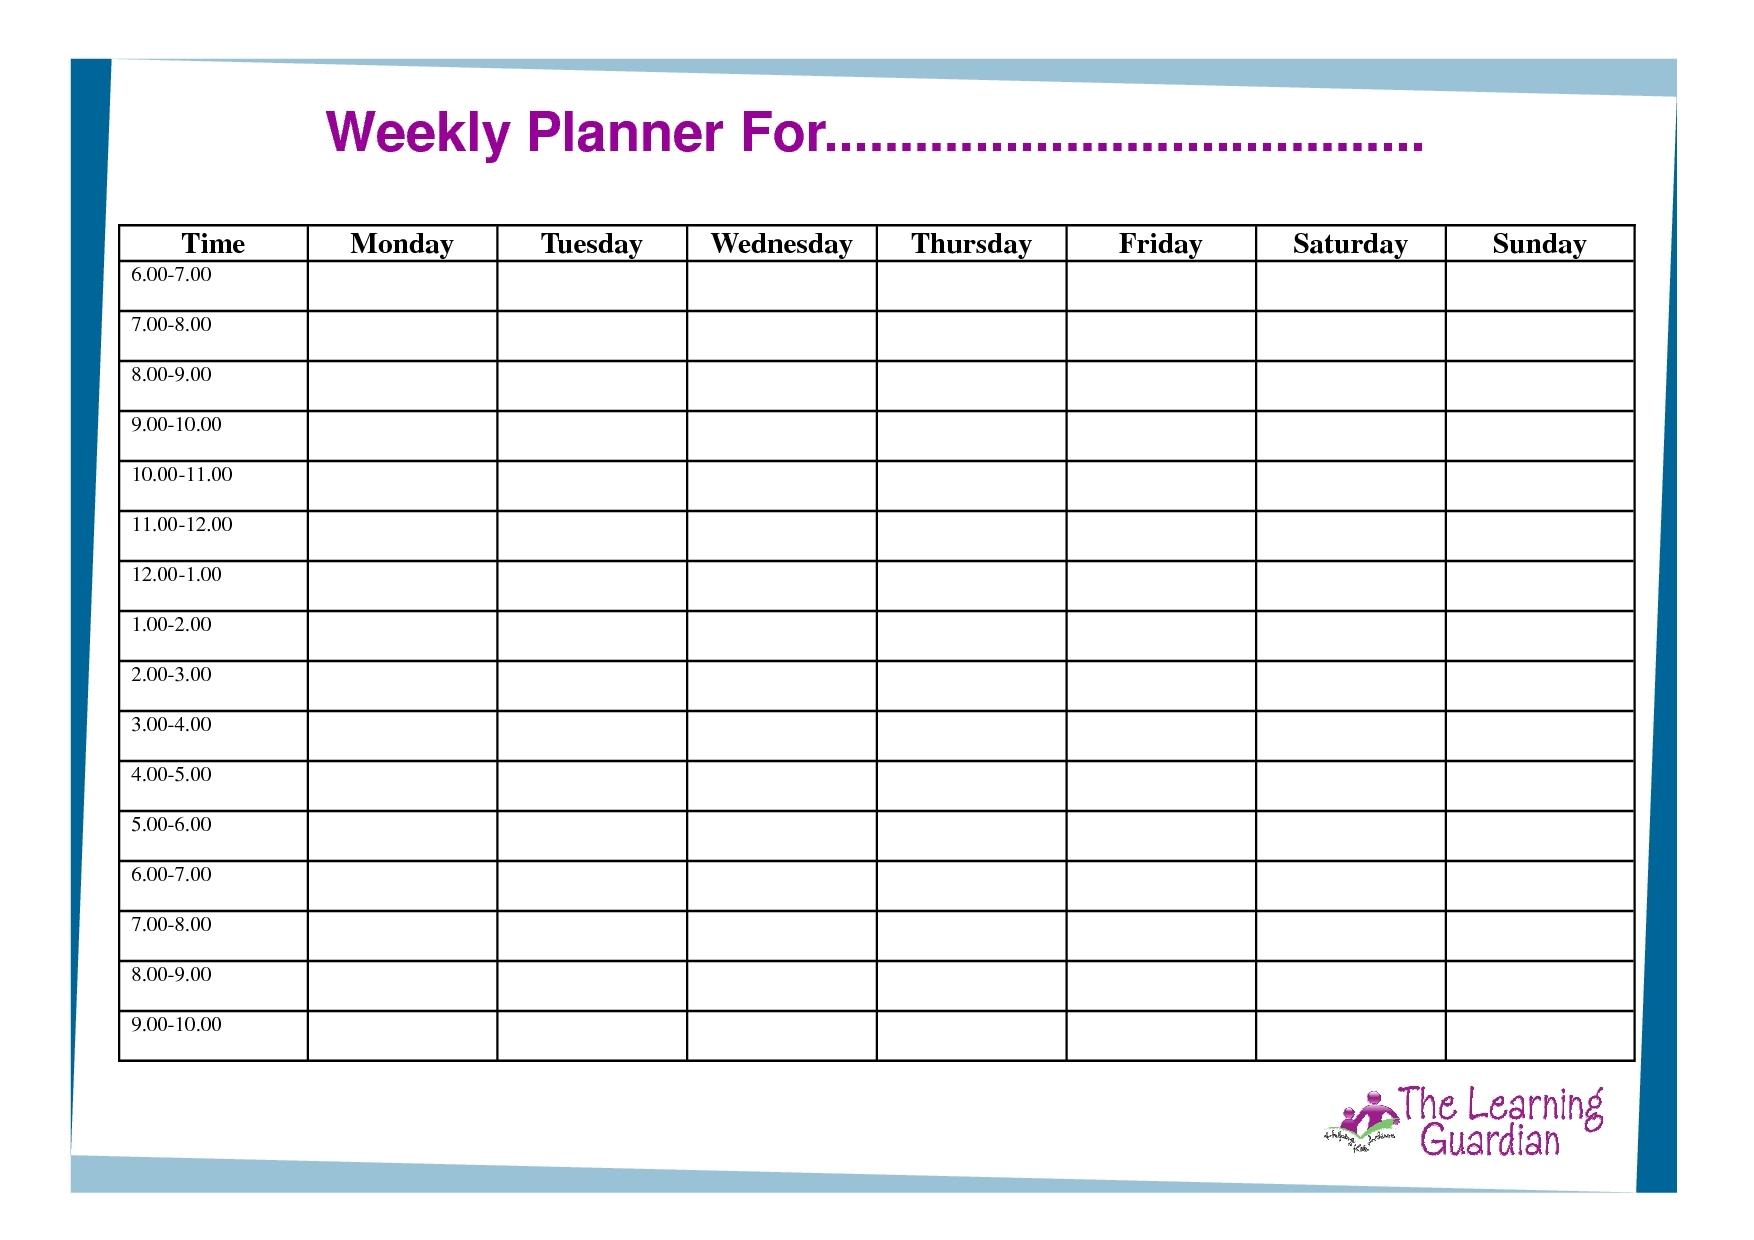 One Week Calendar With Hours - Calendar Inspiration Design